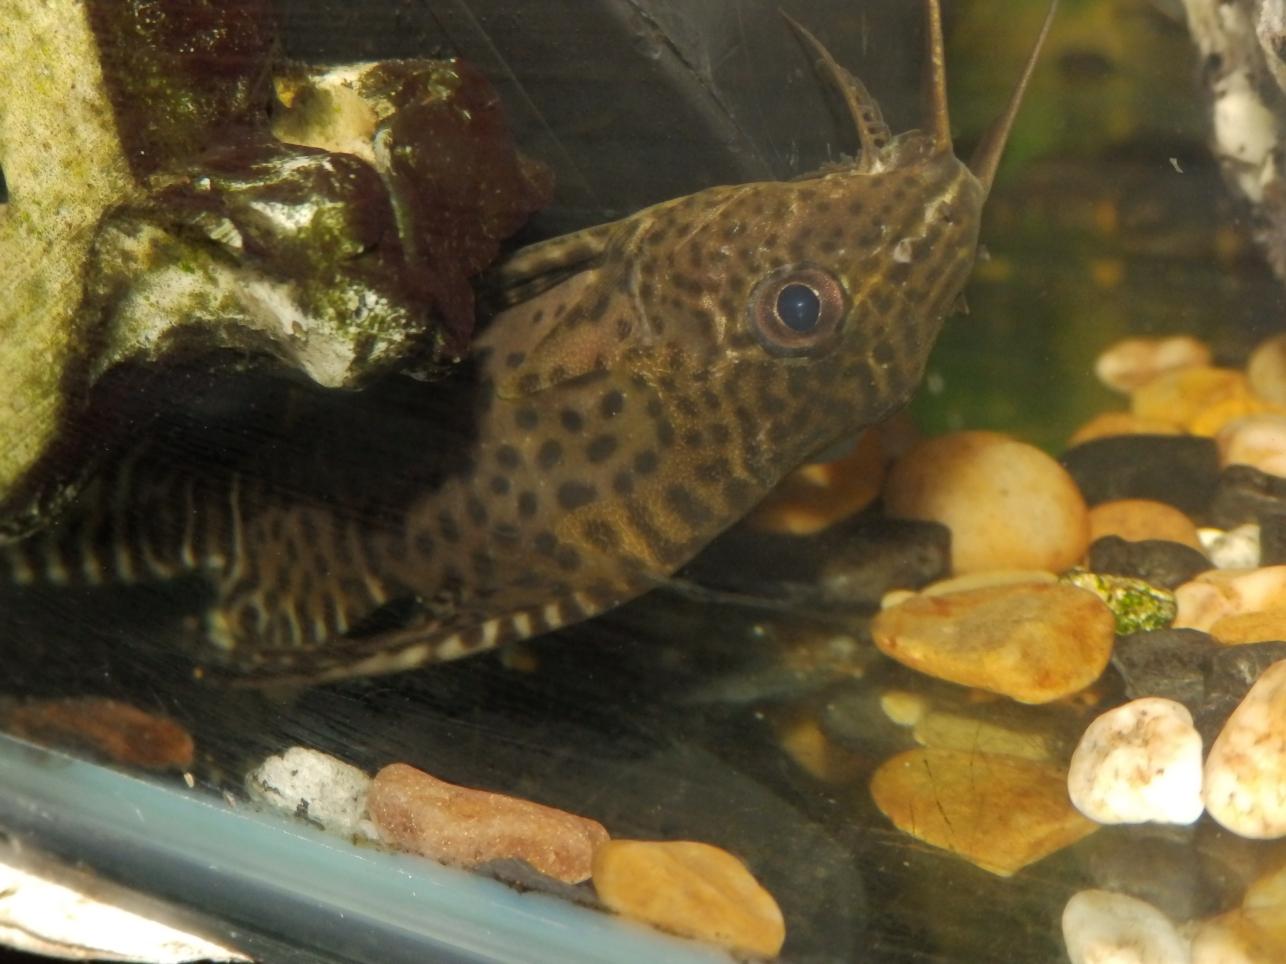 Reptiles Amphibians Amp Fish Synodontis Eurostymus Upsie